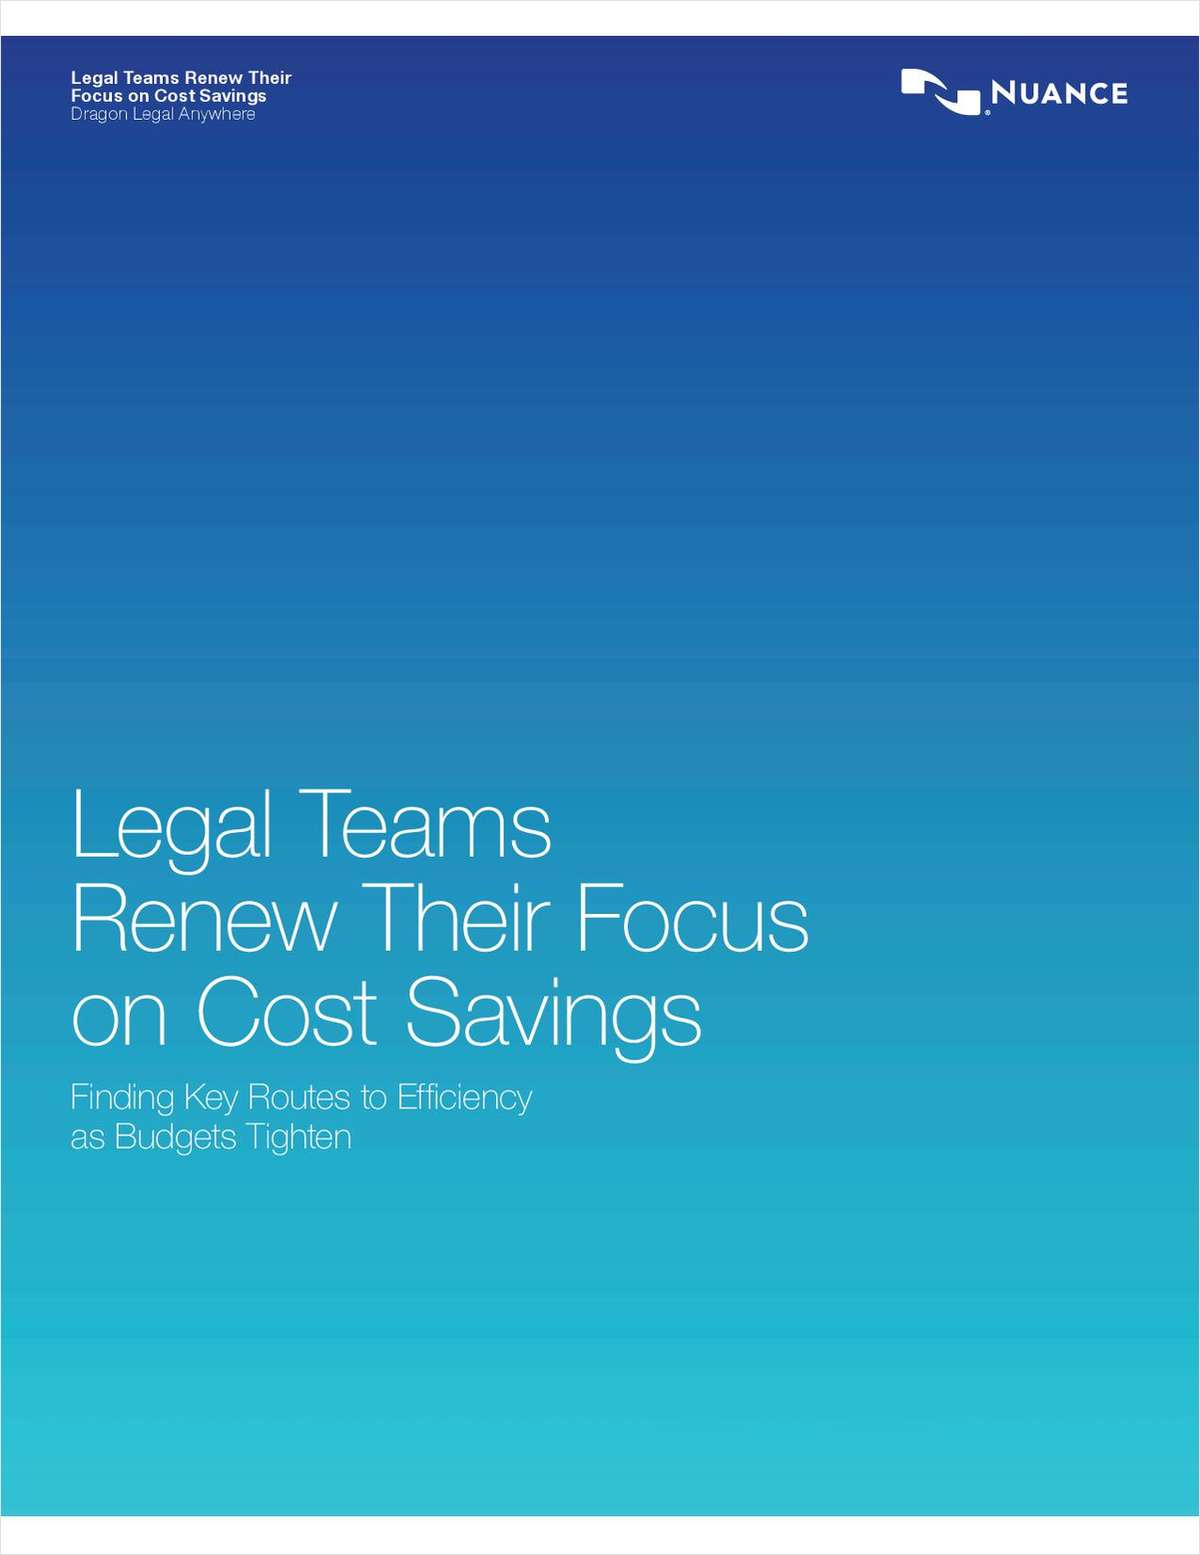 How Legal Teams Renew Their Focus on Cost Savings